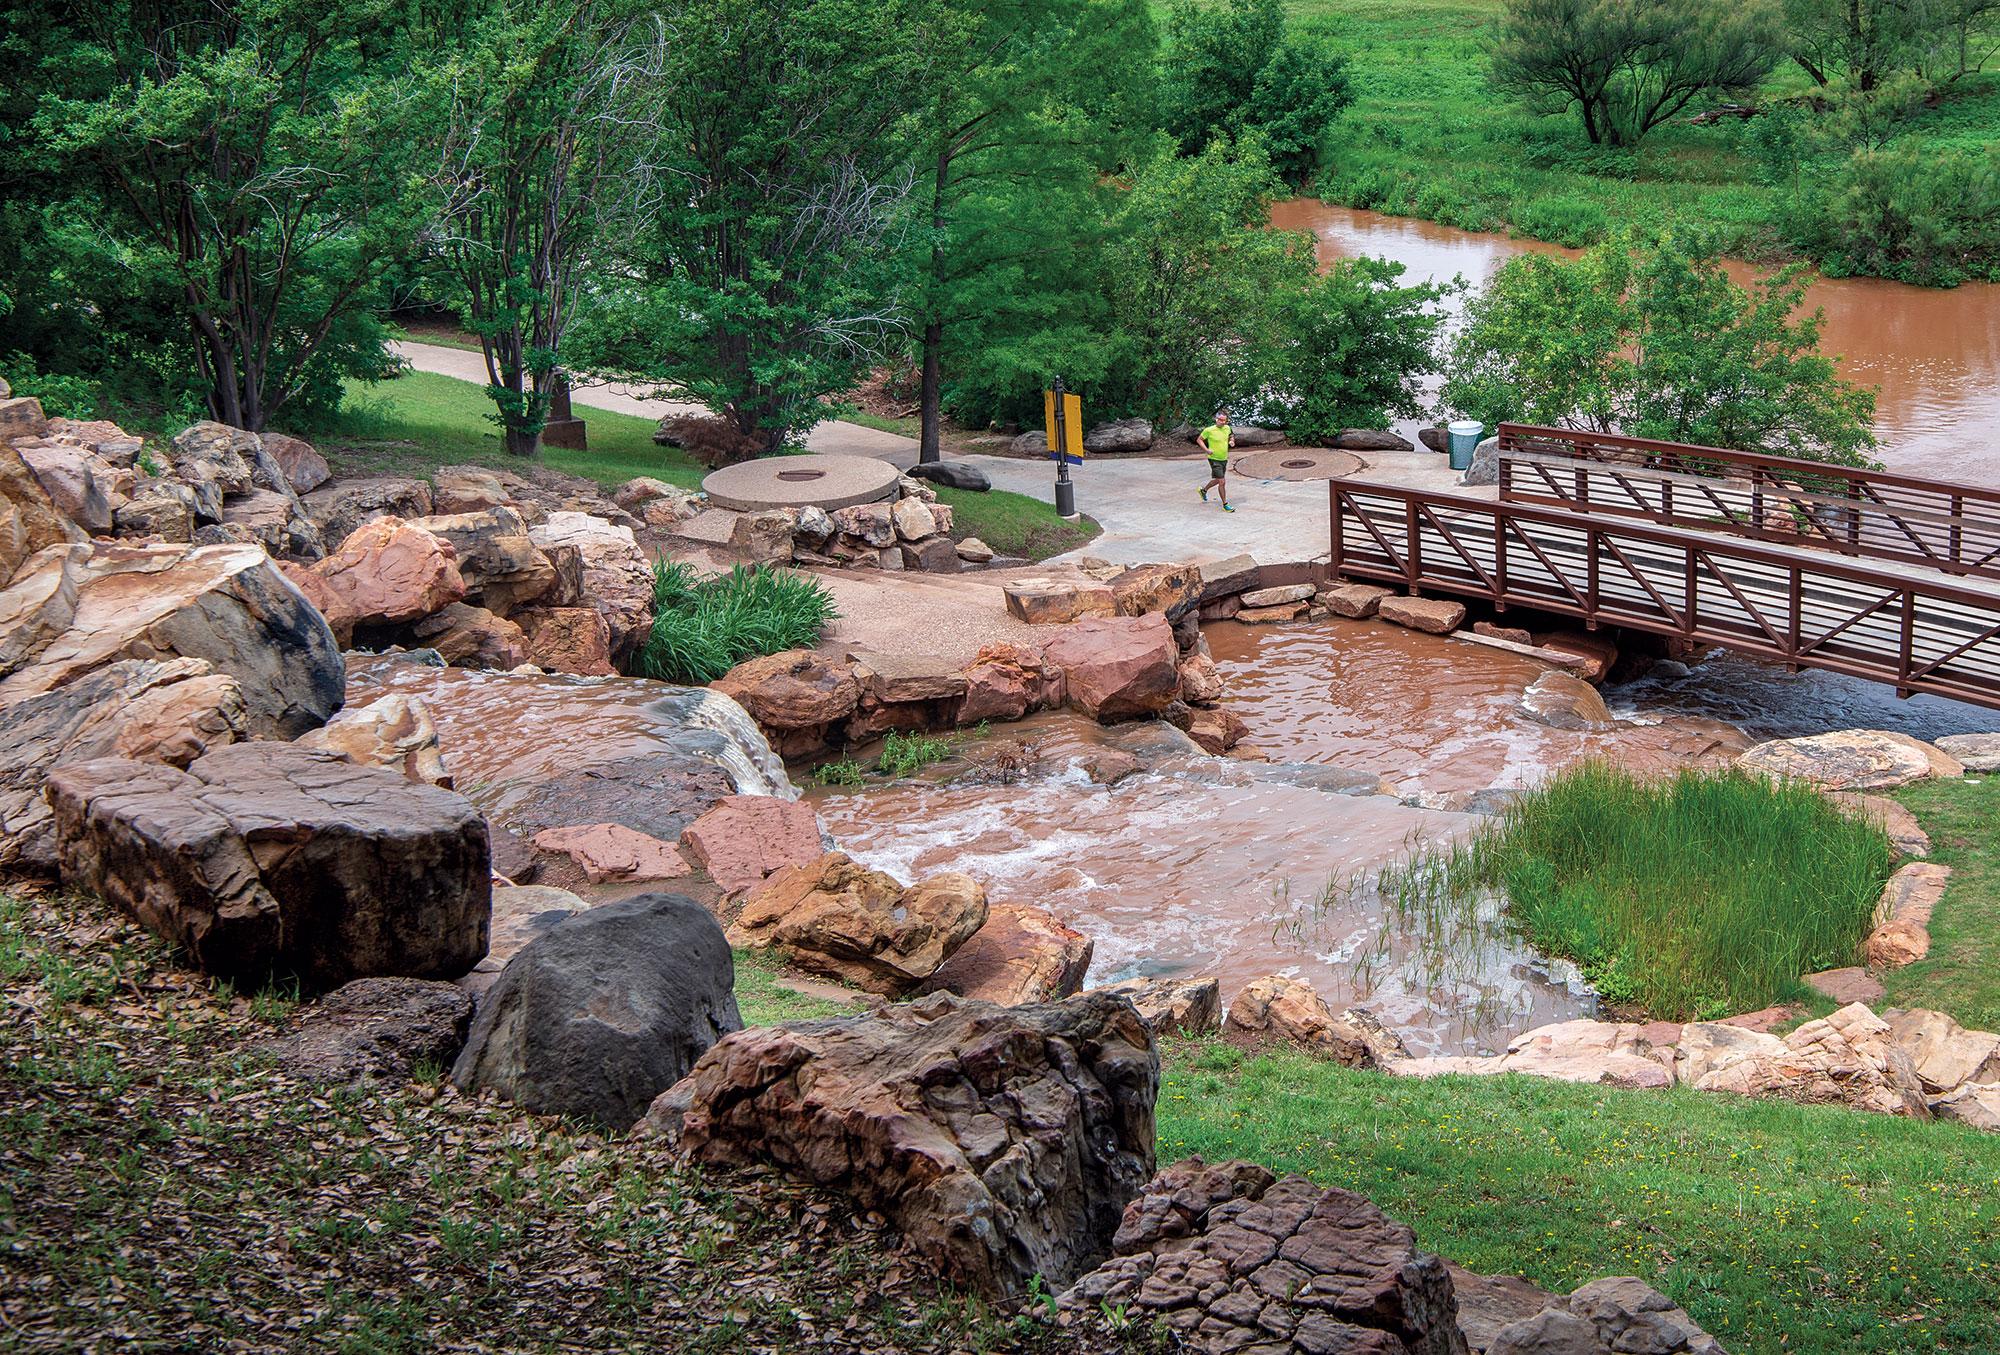 Summer Getaway: A Weekend in Wichita Falls